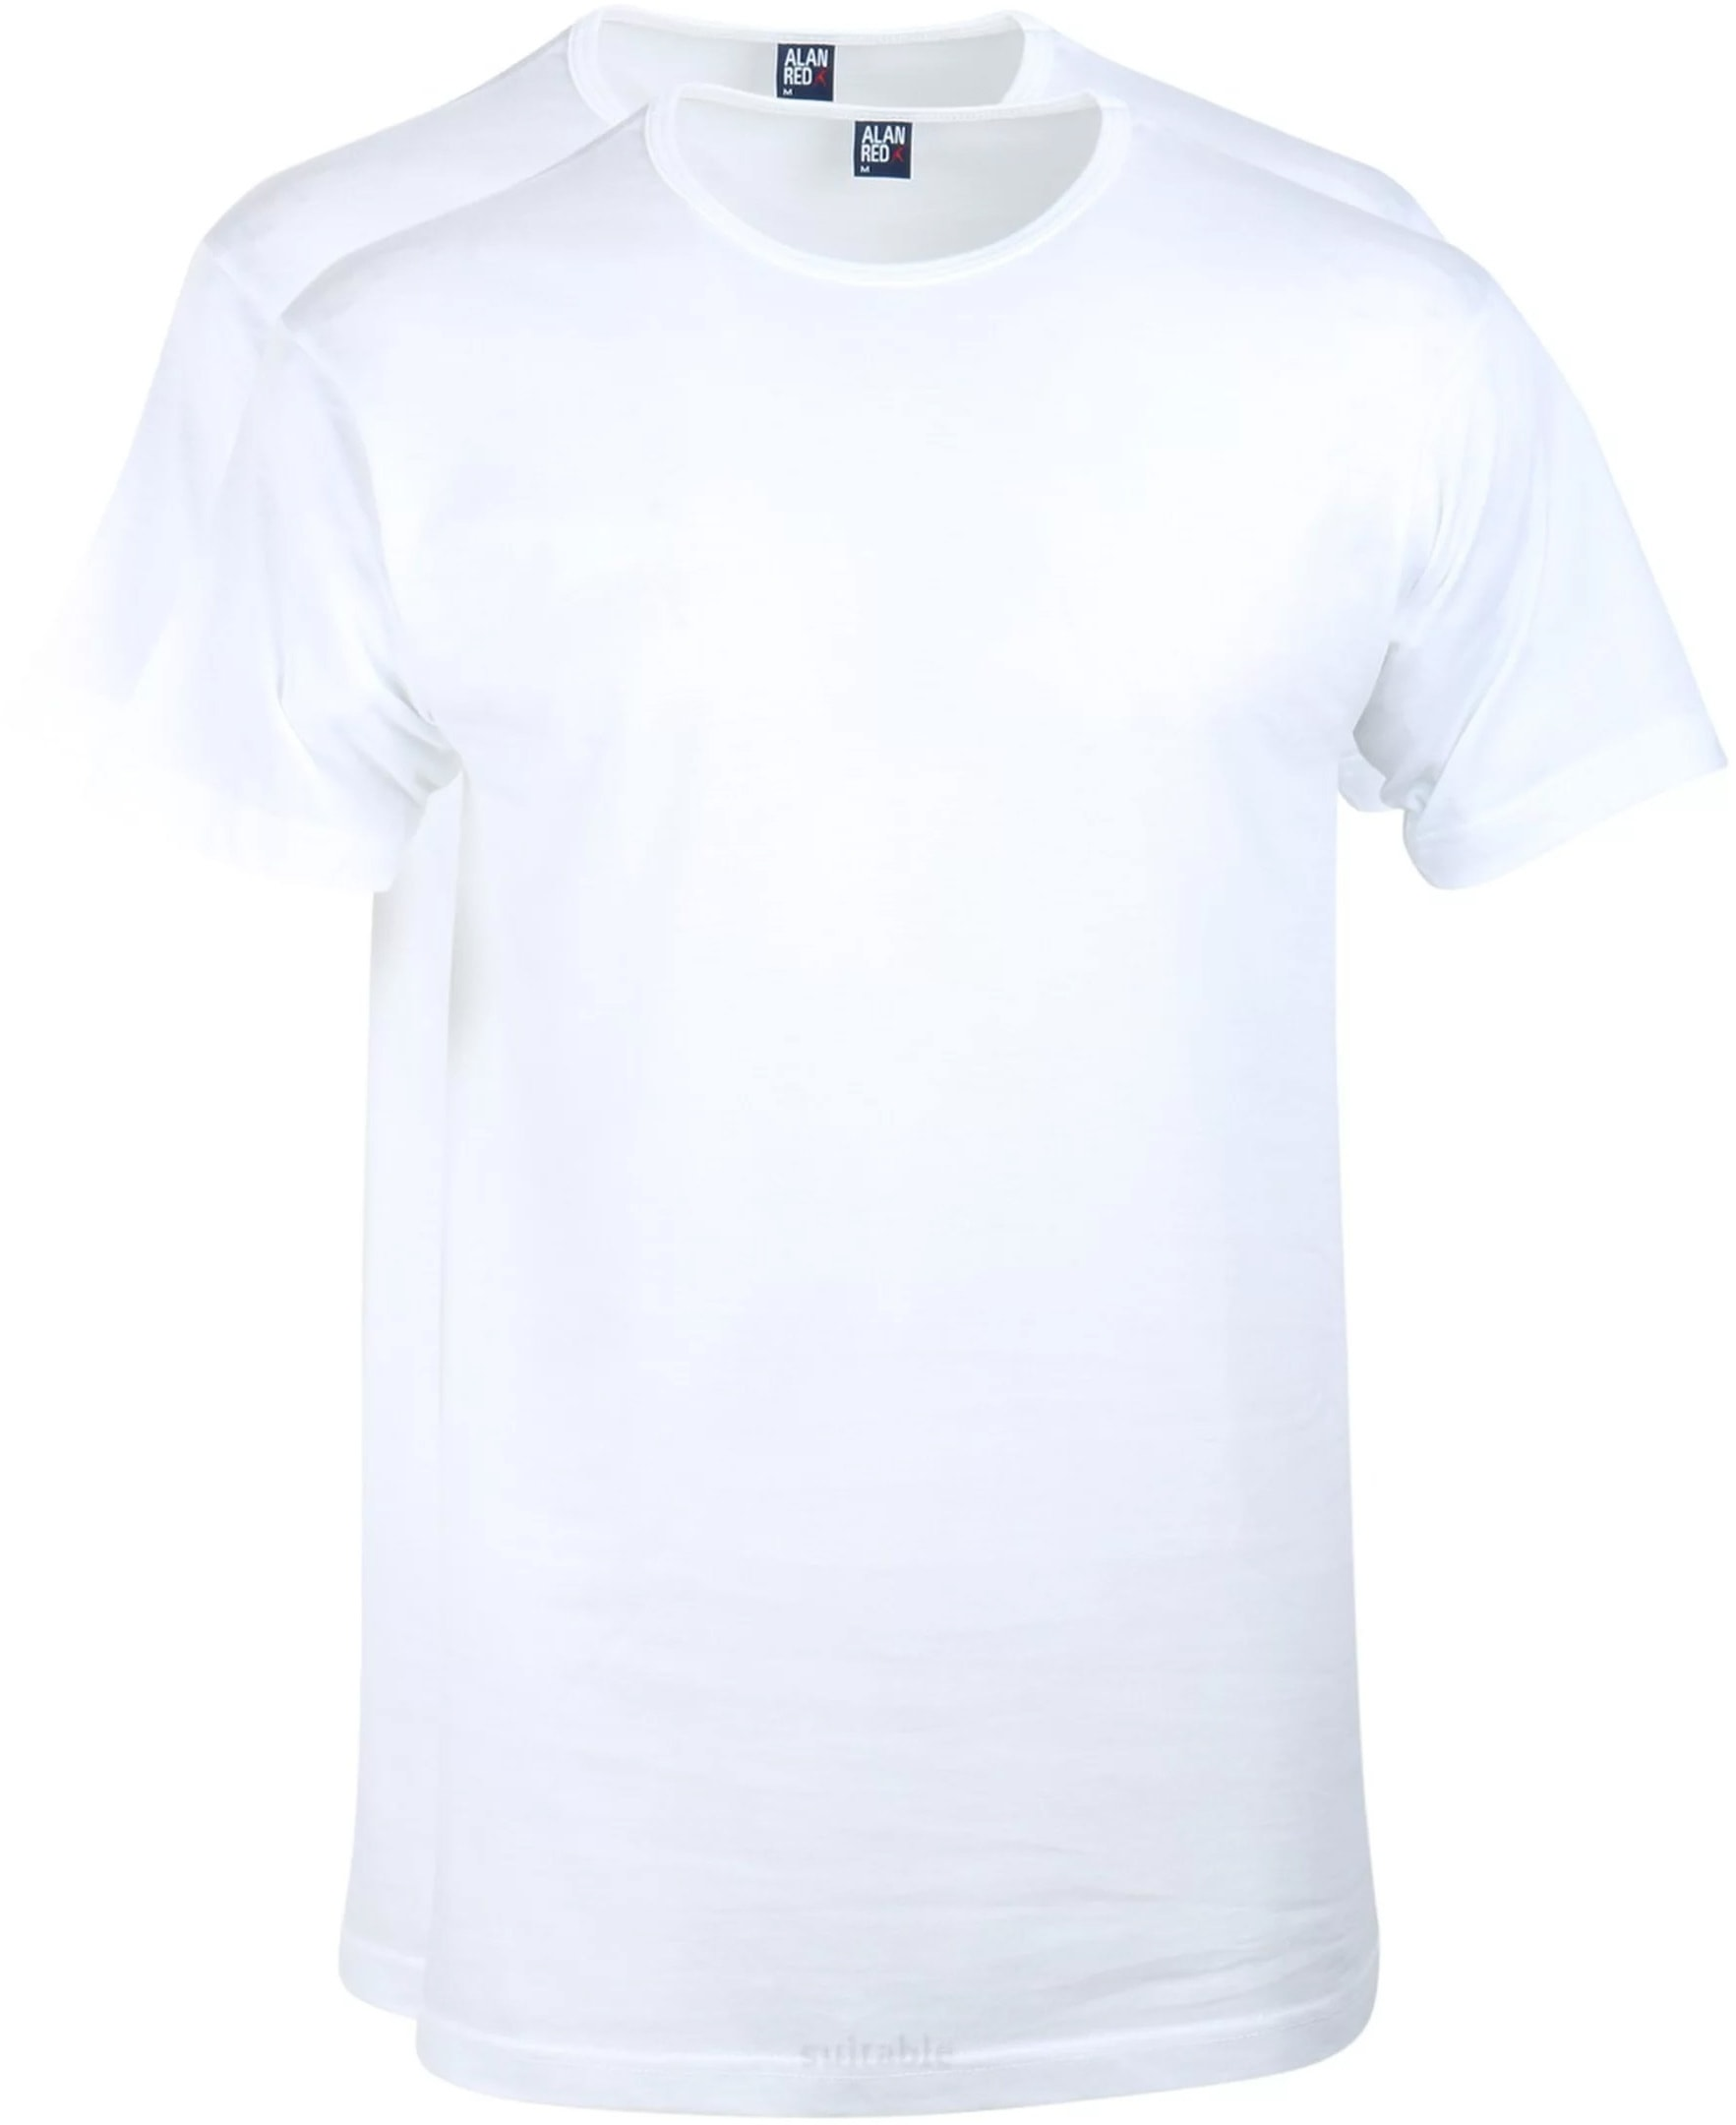 Alan Red T-Shirt Derby Weiß  (2er-Pack) foto 0